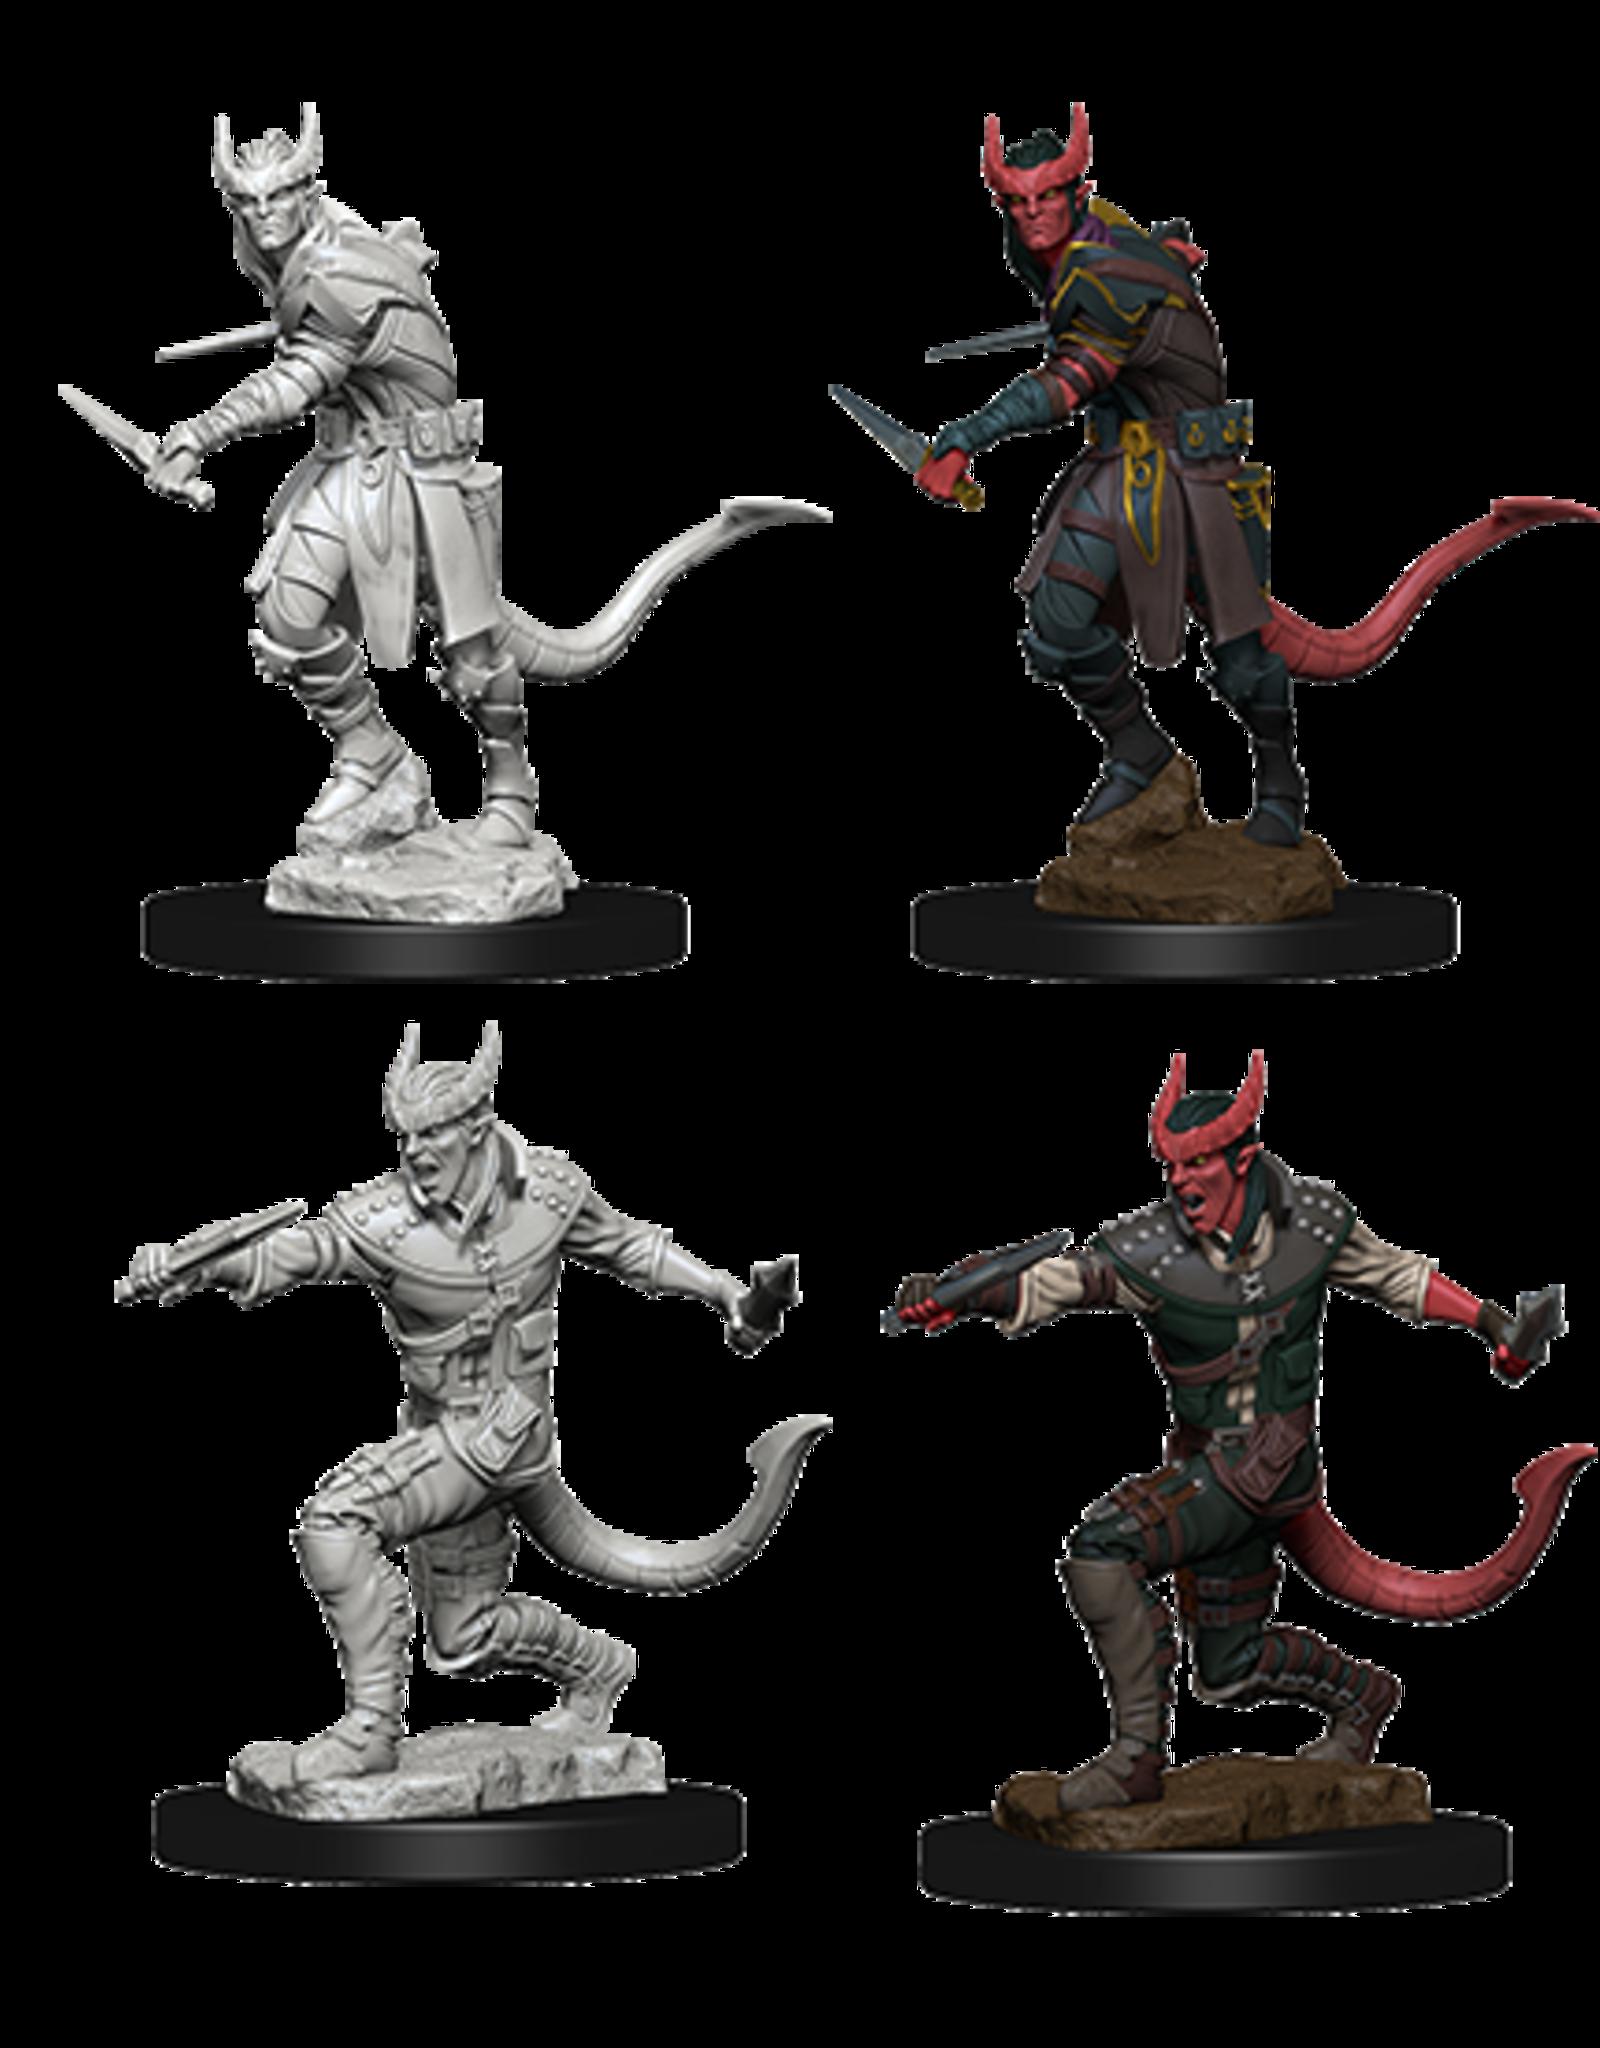 Dungeons & Dragons D&D NMU - Tiefling Rogue